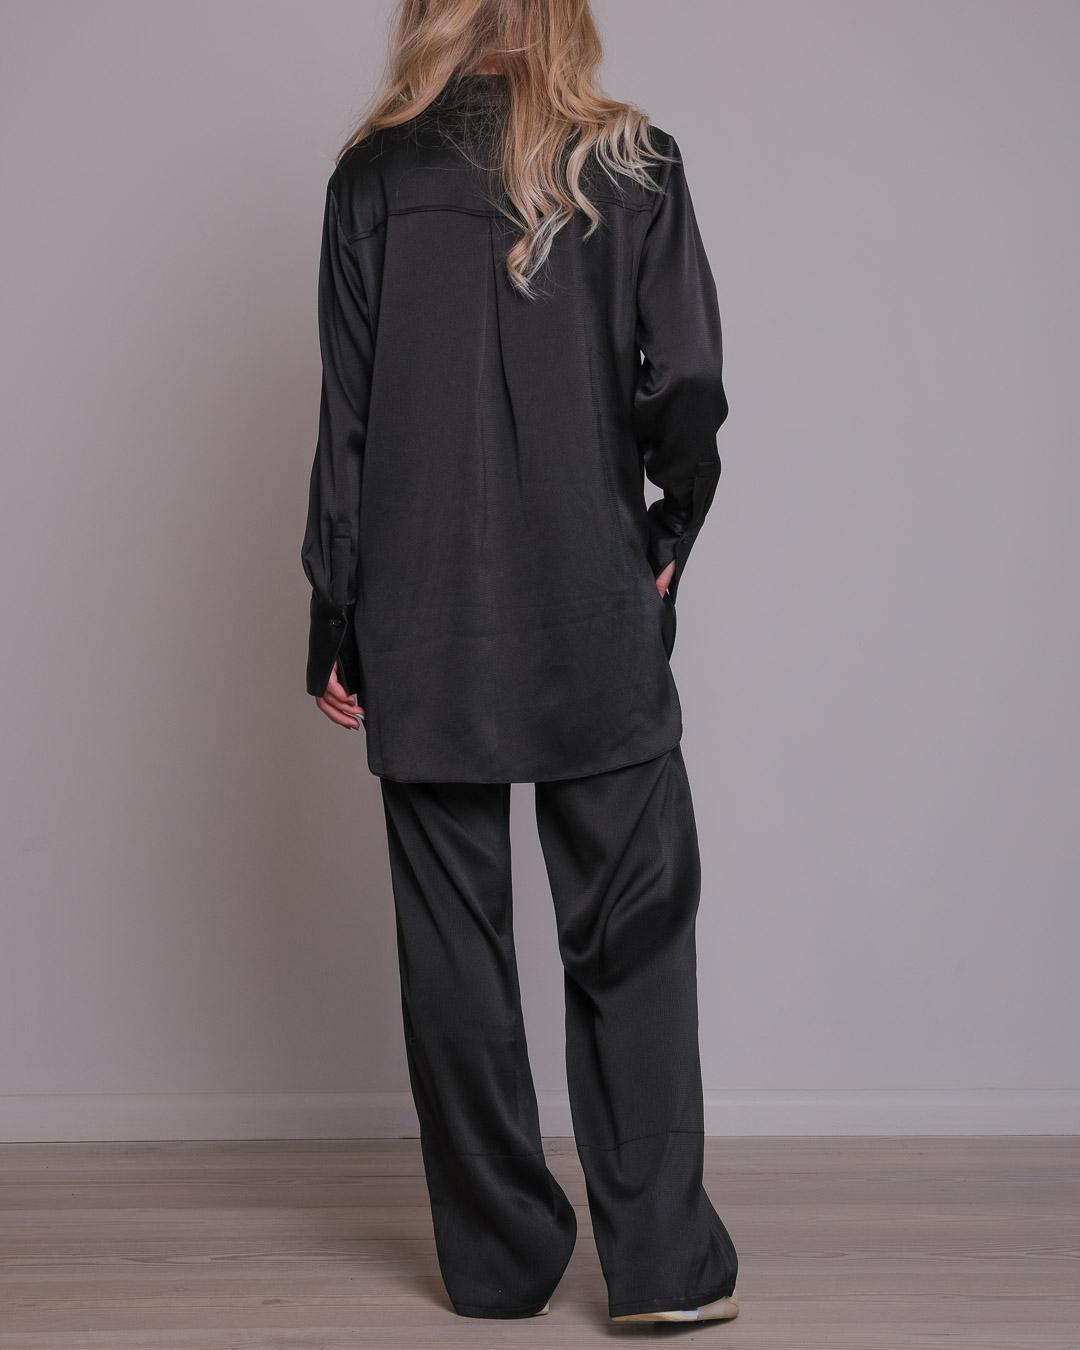 Neo Noir Kuli bukser, black, 42